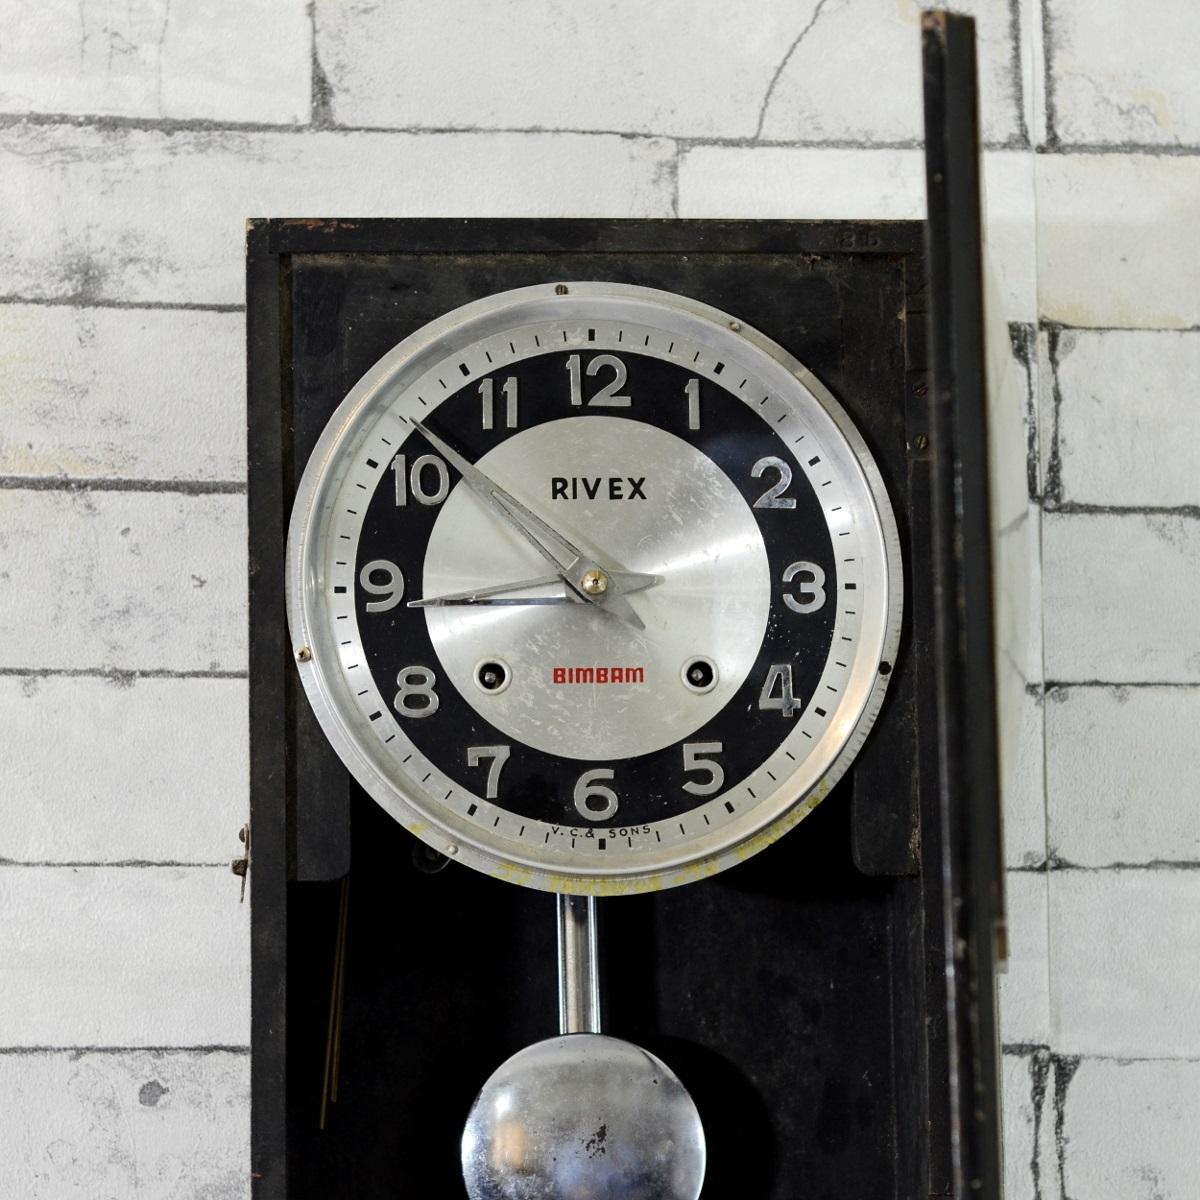 Antique rivex bim bam pendulum wall clock antikcart antikcart antique rivex bim bam pendulum wall clock dial view amipublicfo Images